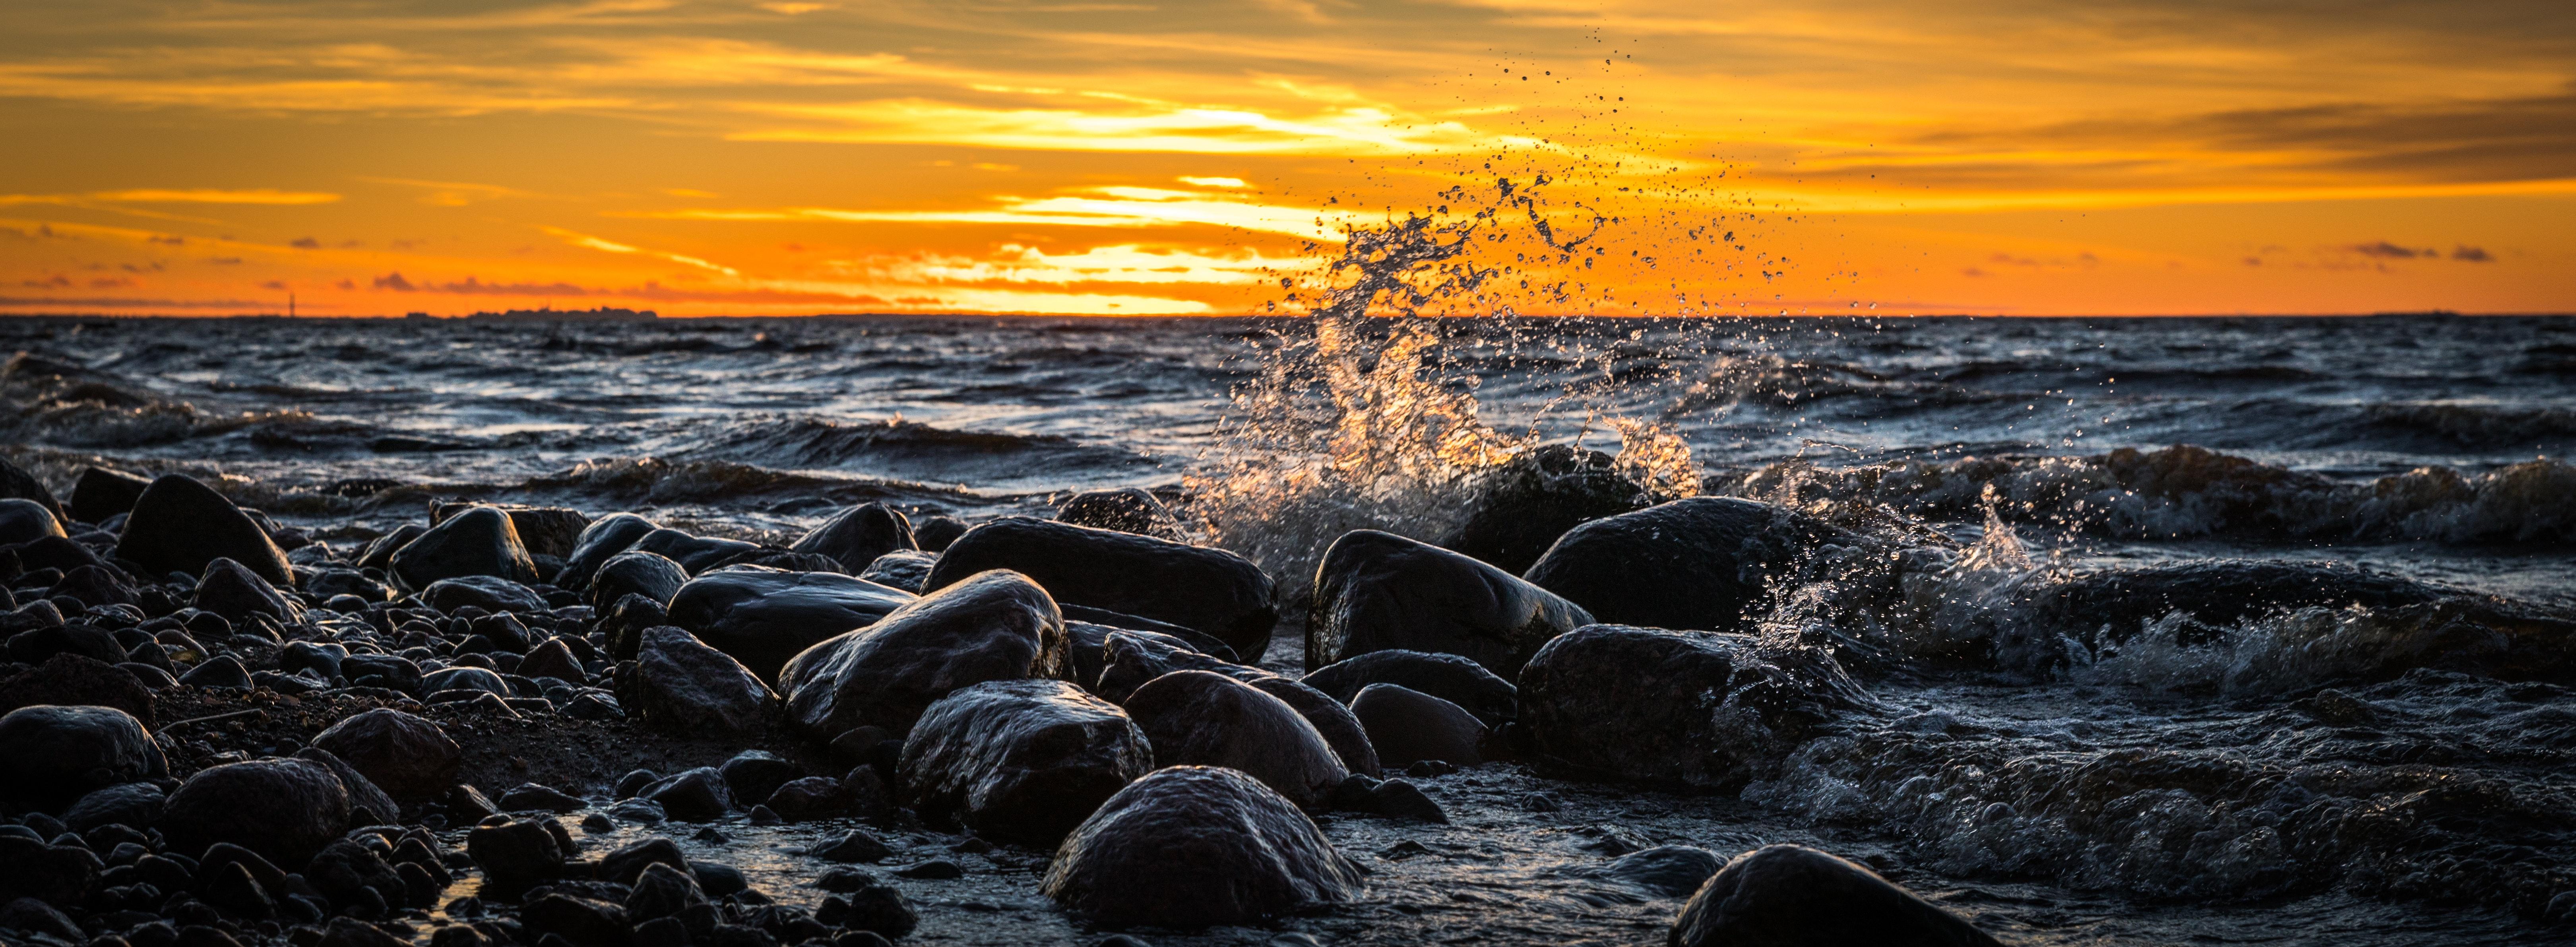 Waves Splashing at Stones on Beach during Sunset, Beach, Shore, Water, Travel, HQ Photo